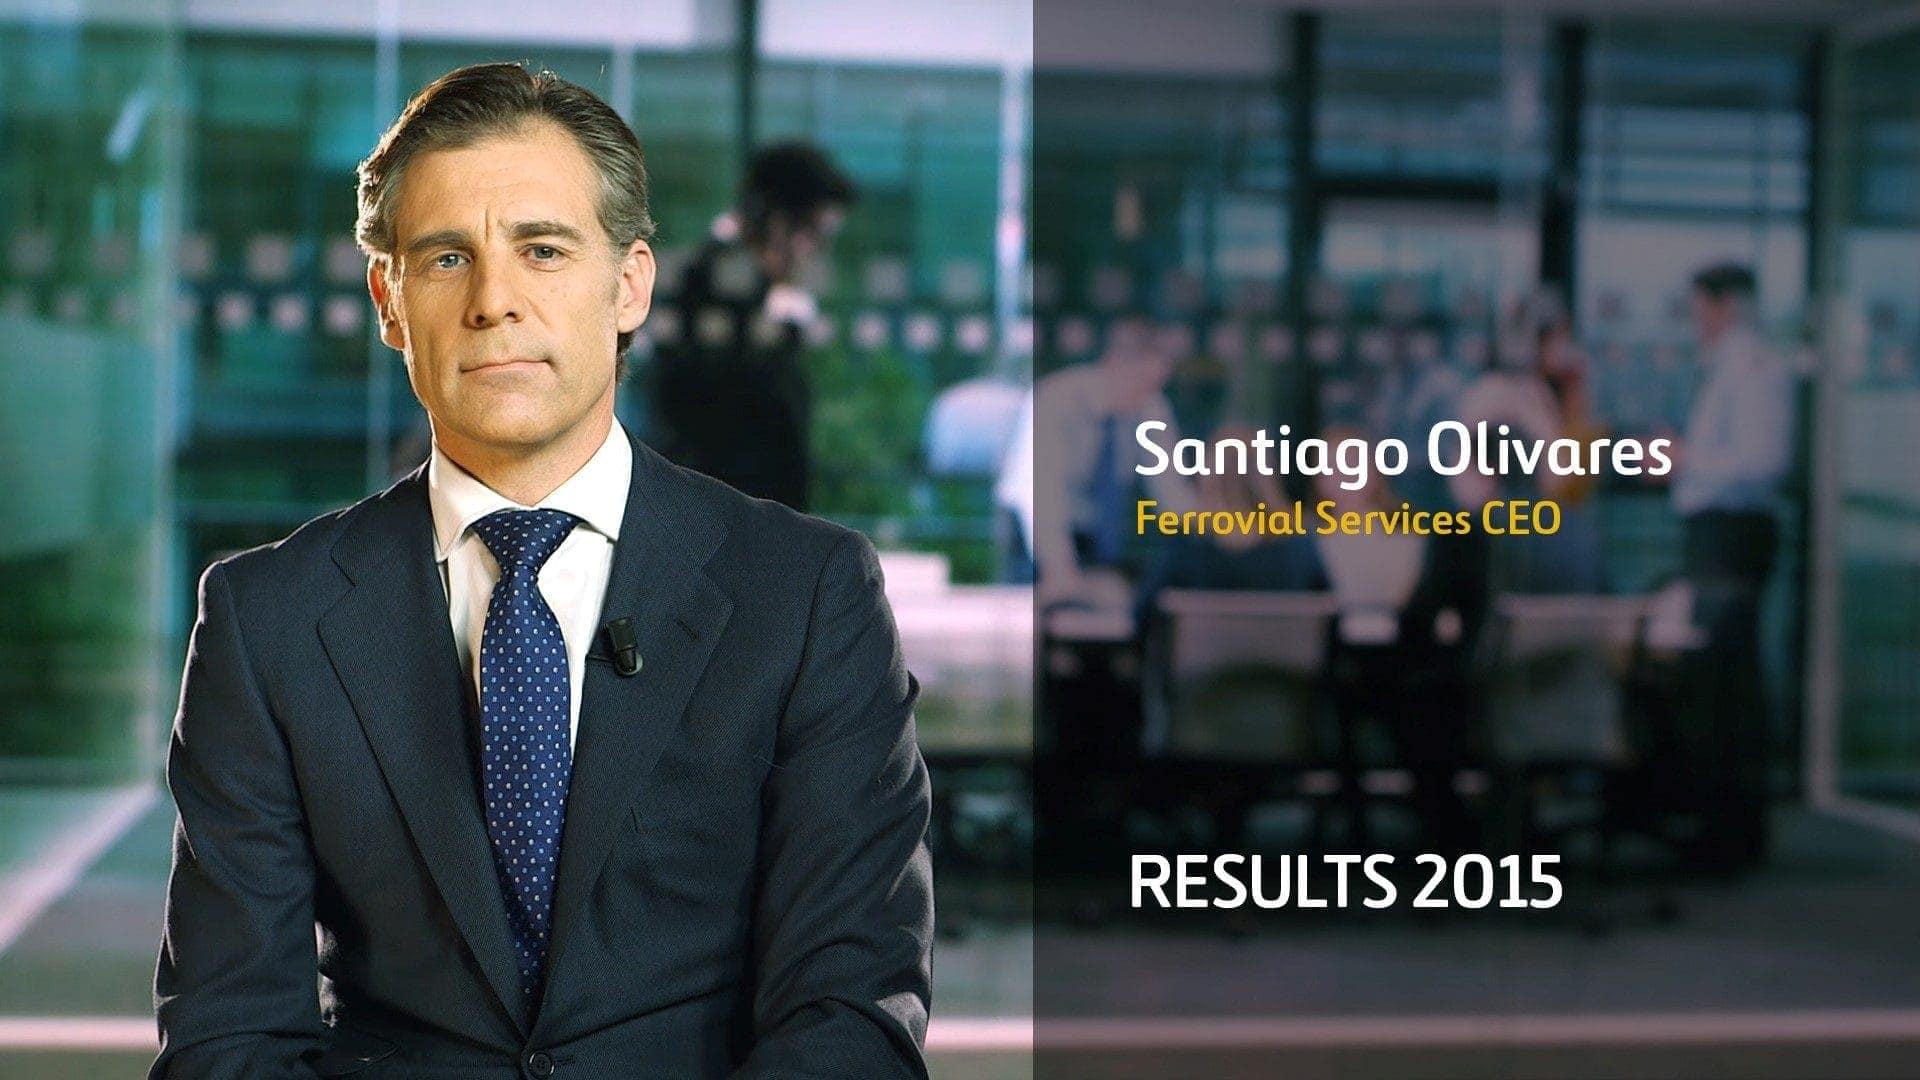 Santiago Olivares Ferrovial Services Results 2015